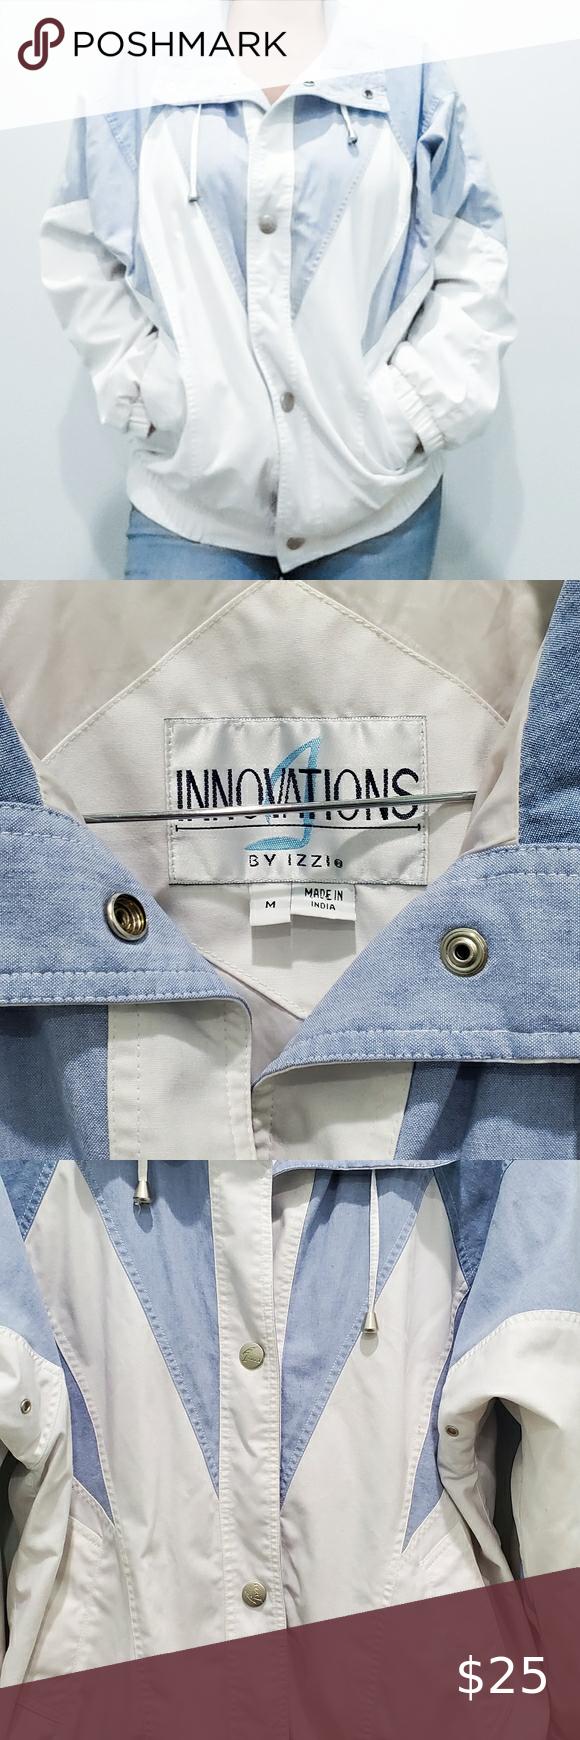 Vintage Innovations By Izzi Coat Medium In 2021 Best Winter Coats Denim Coat Leather Jackets Women [ 1740 x 580 Pixel ]